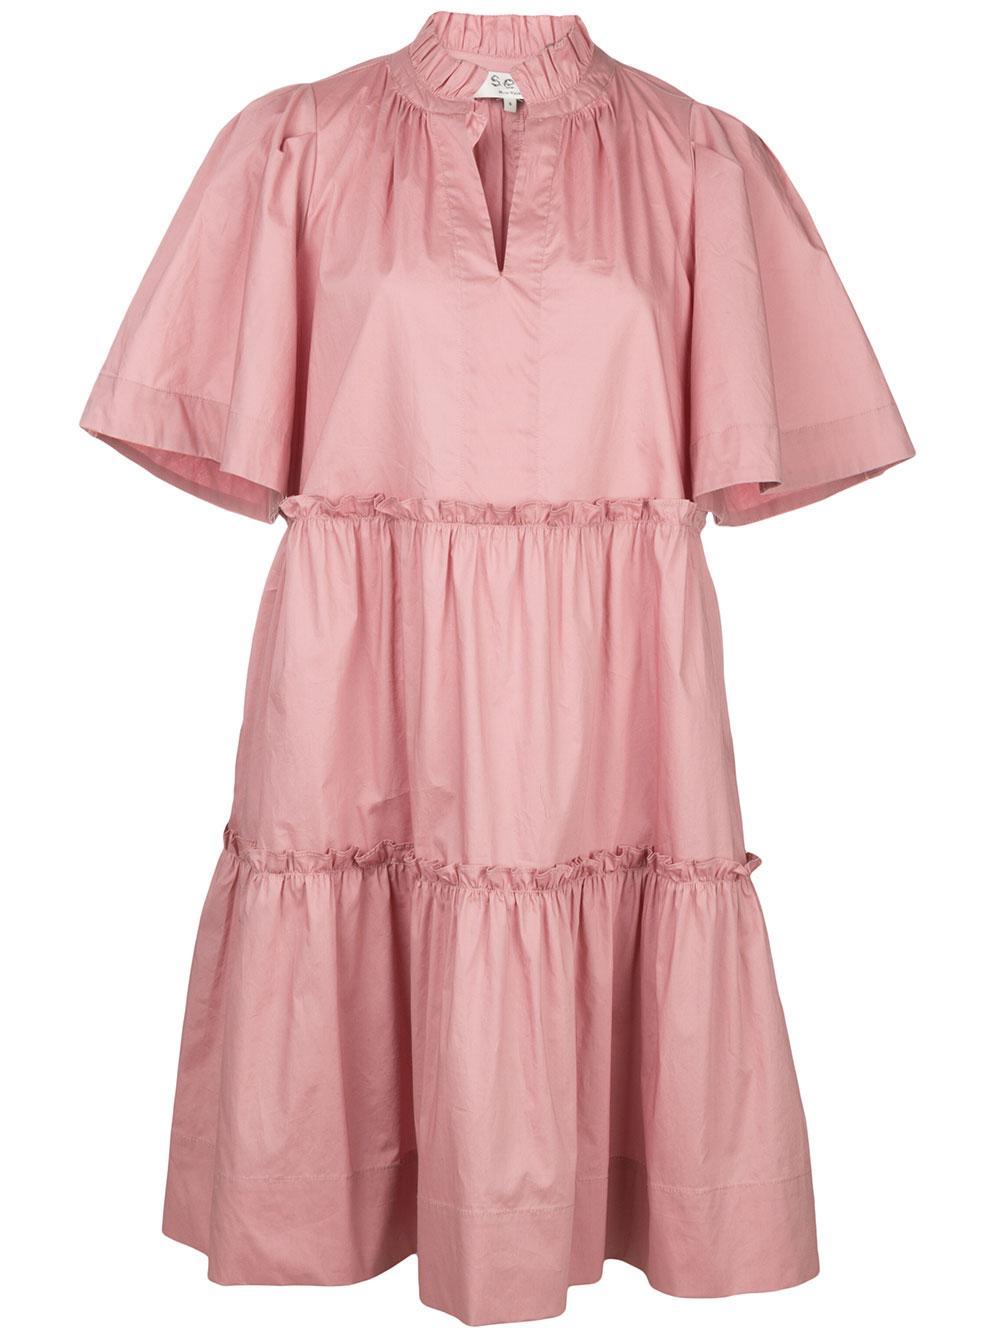 Clara Tiered Dress